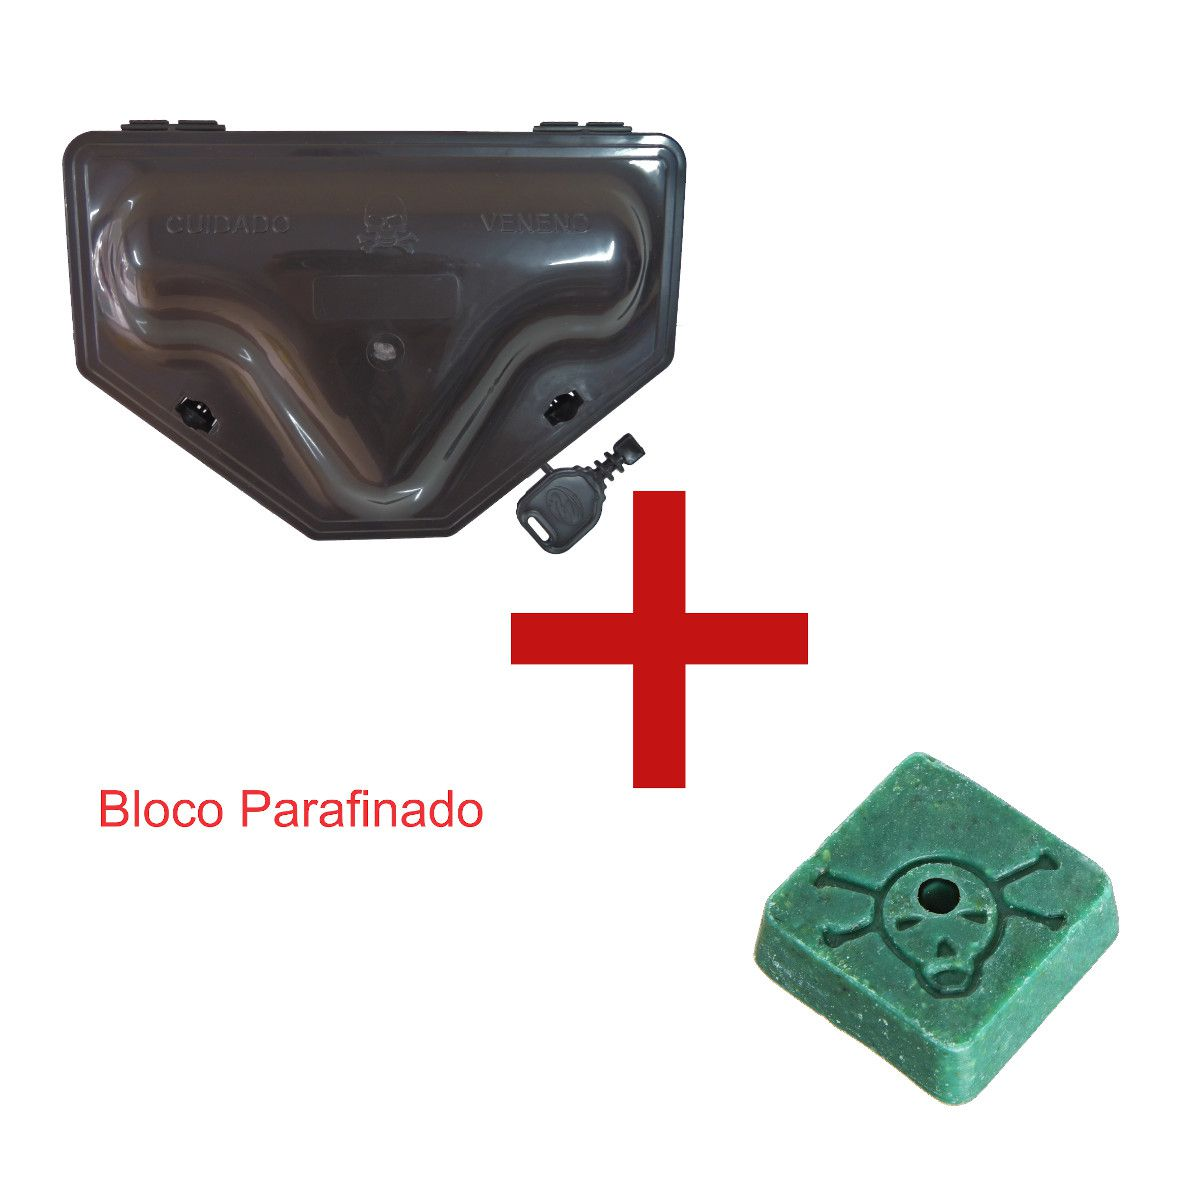 KIT 35 Porta Iscas Reforçado Ratoeira 2 TRAVAS Chave p/Ratos